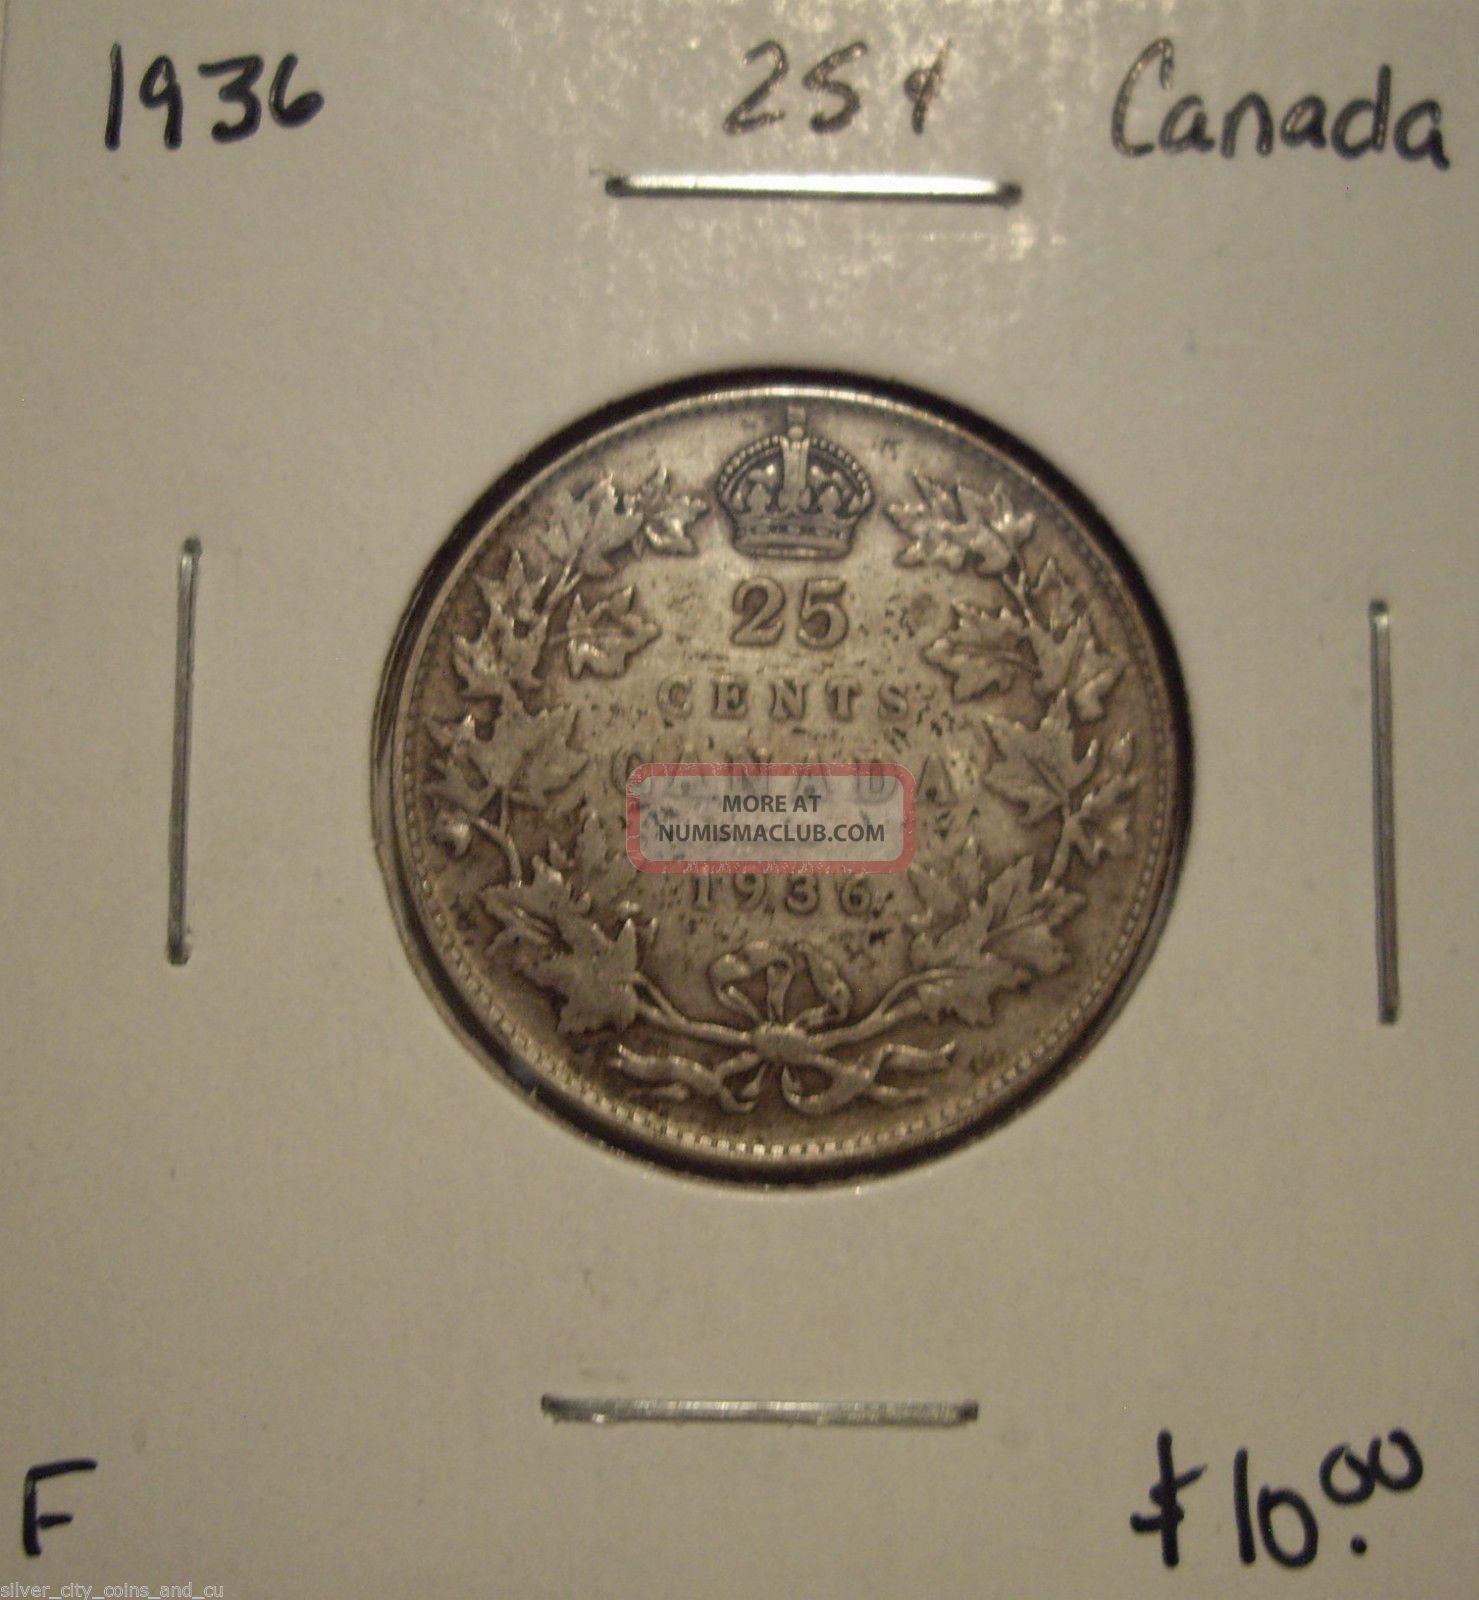 Canada George V 1936 Silver Twenty Five Cents - F Coins: Canada photo